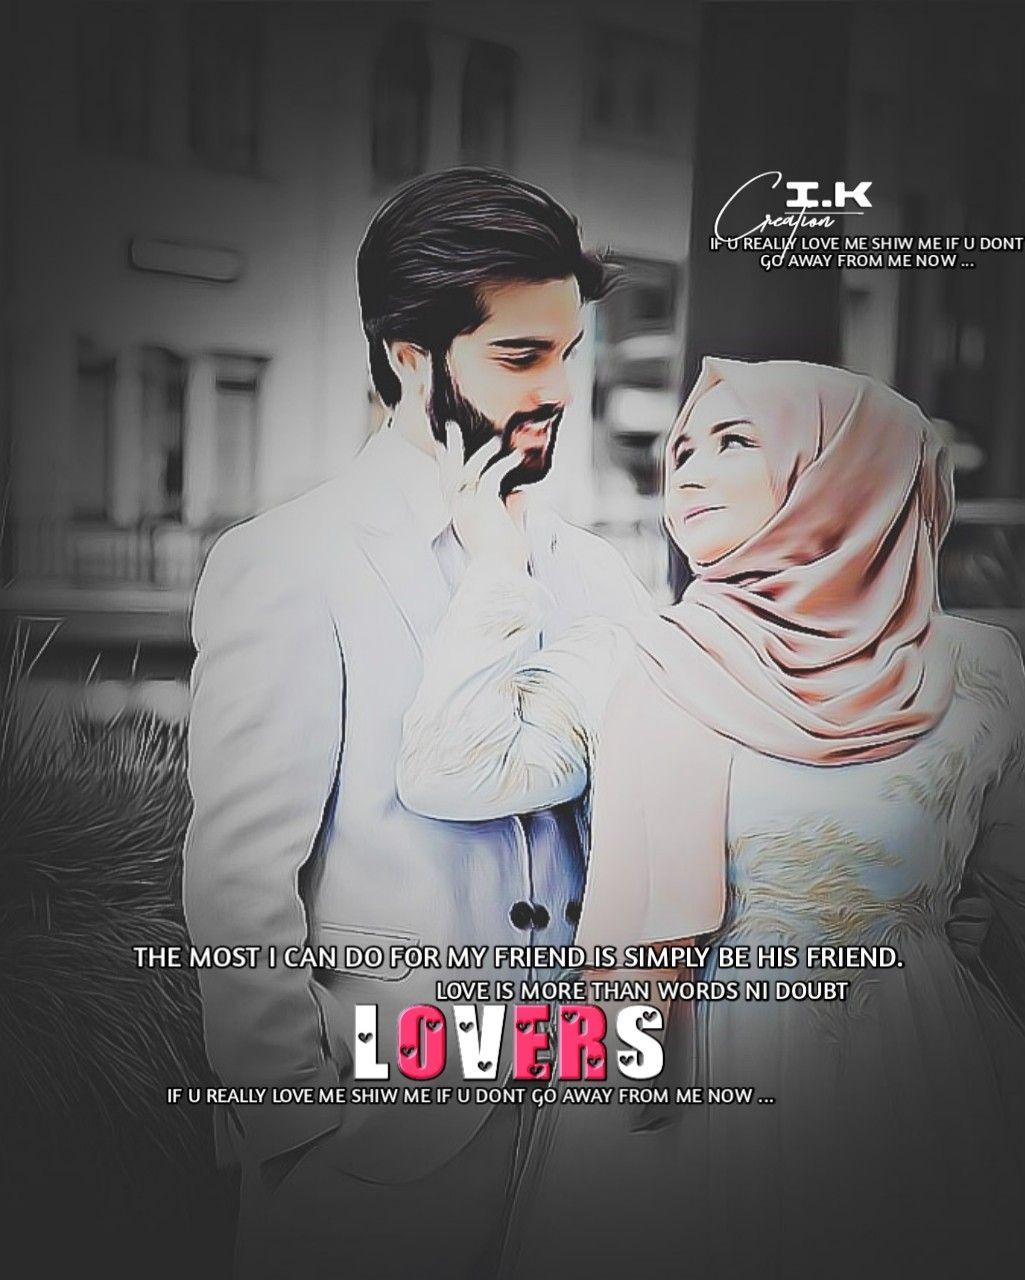 Beautiful couple dp romantic kissing hugging sweet couple dps pakistani couple indian couple abroad couple couplegoals dps islamic couple dps